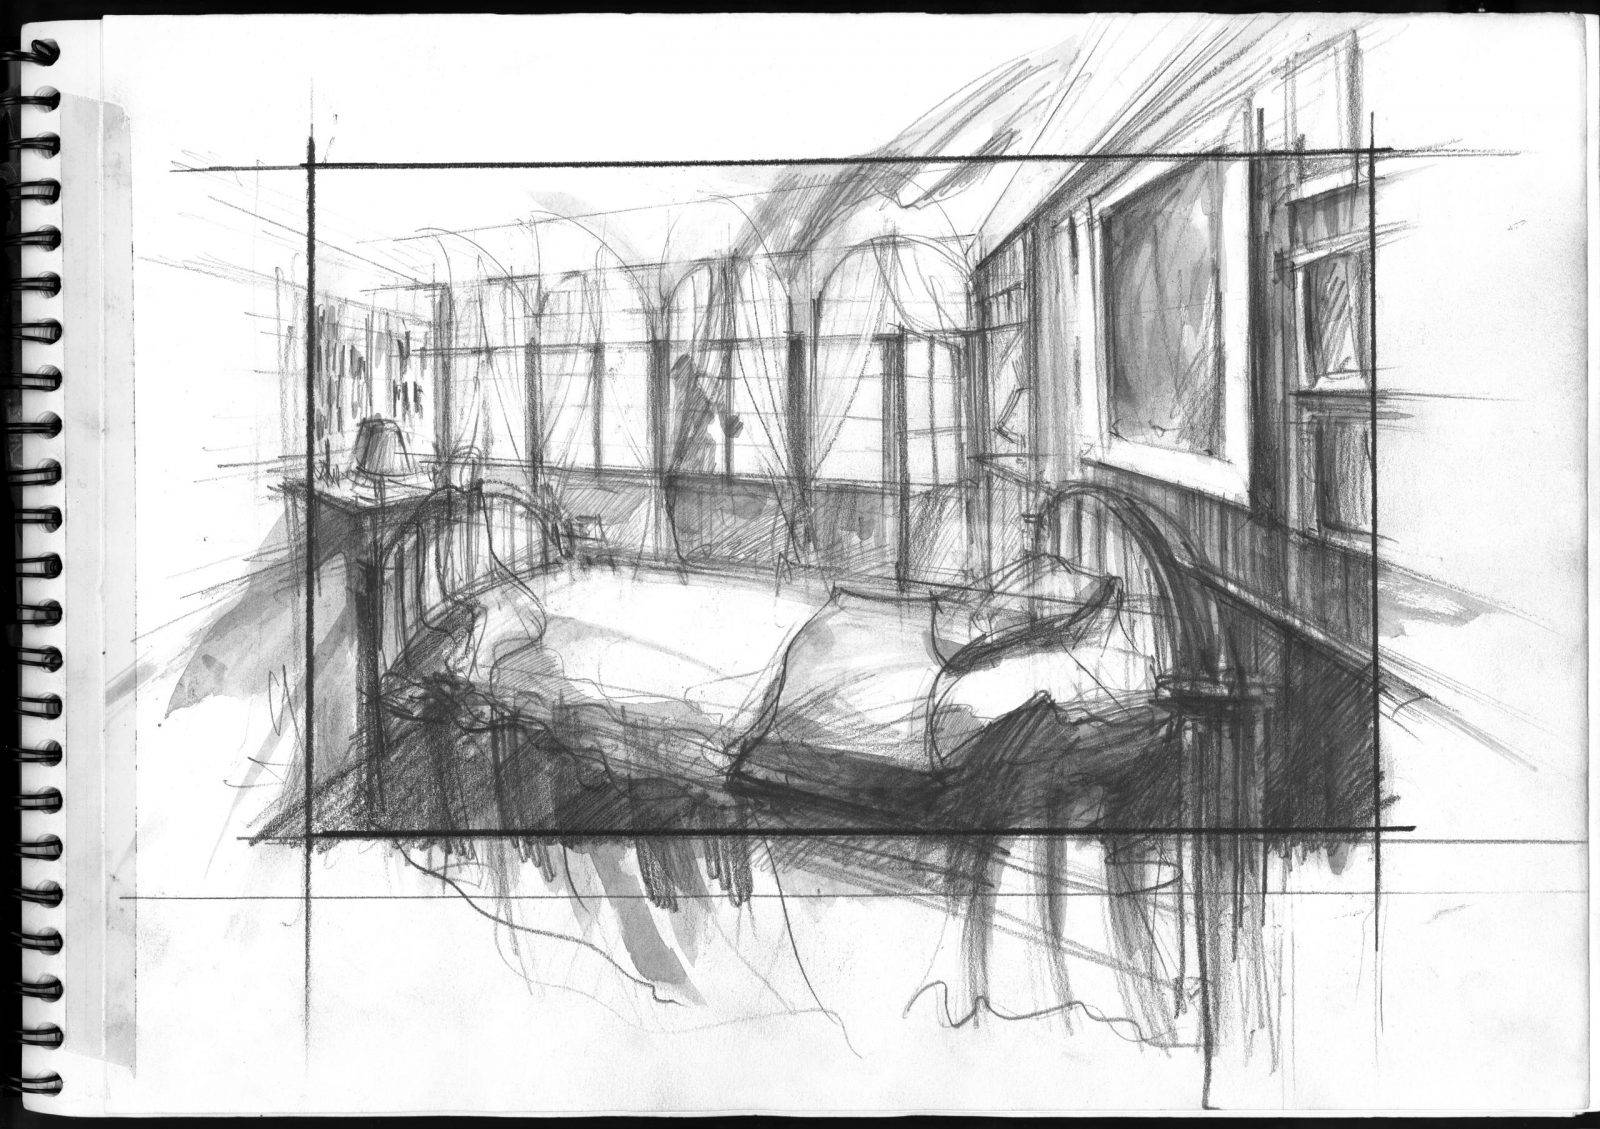 Argimax corectia by Jan Kadlec